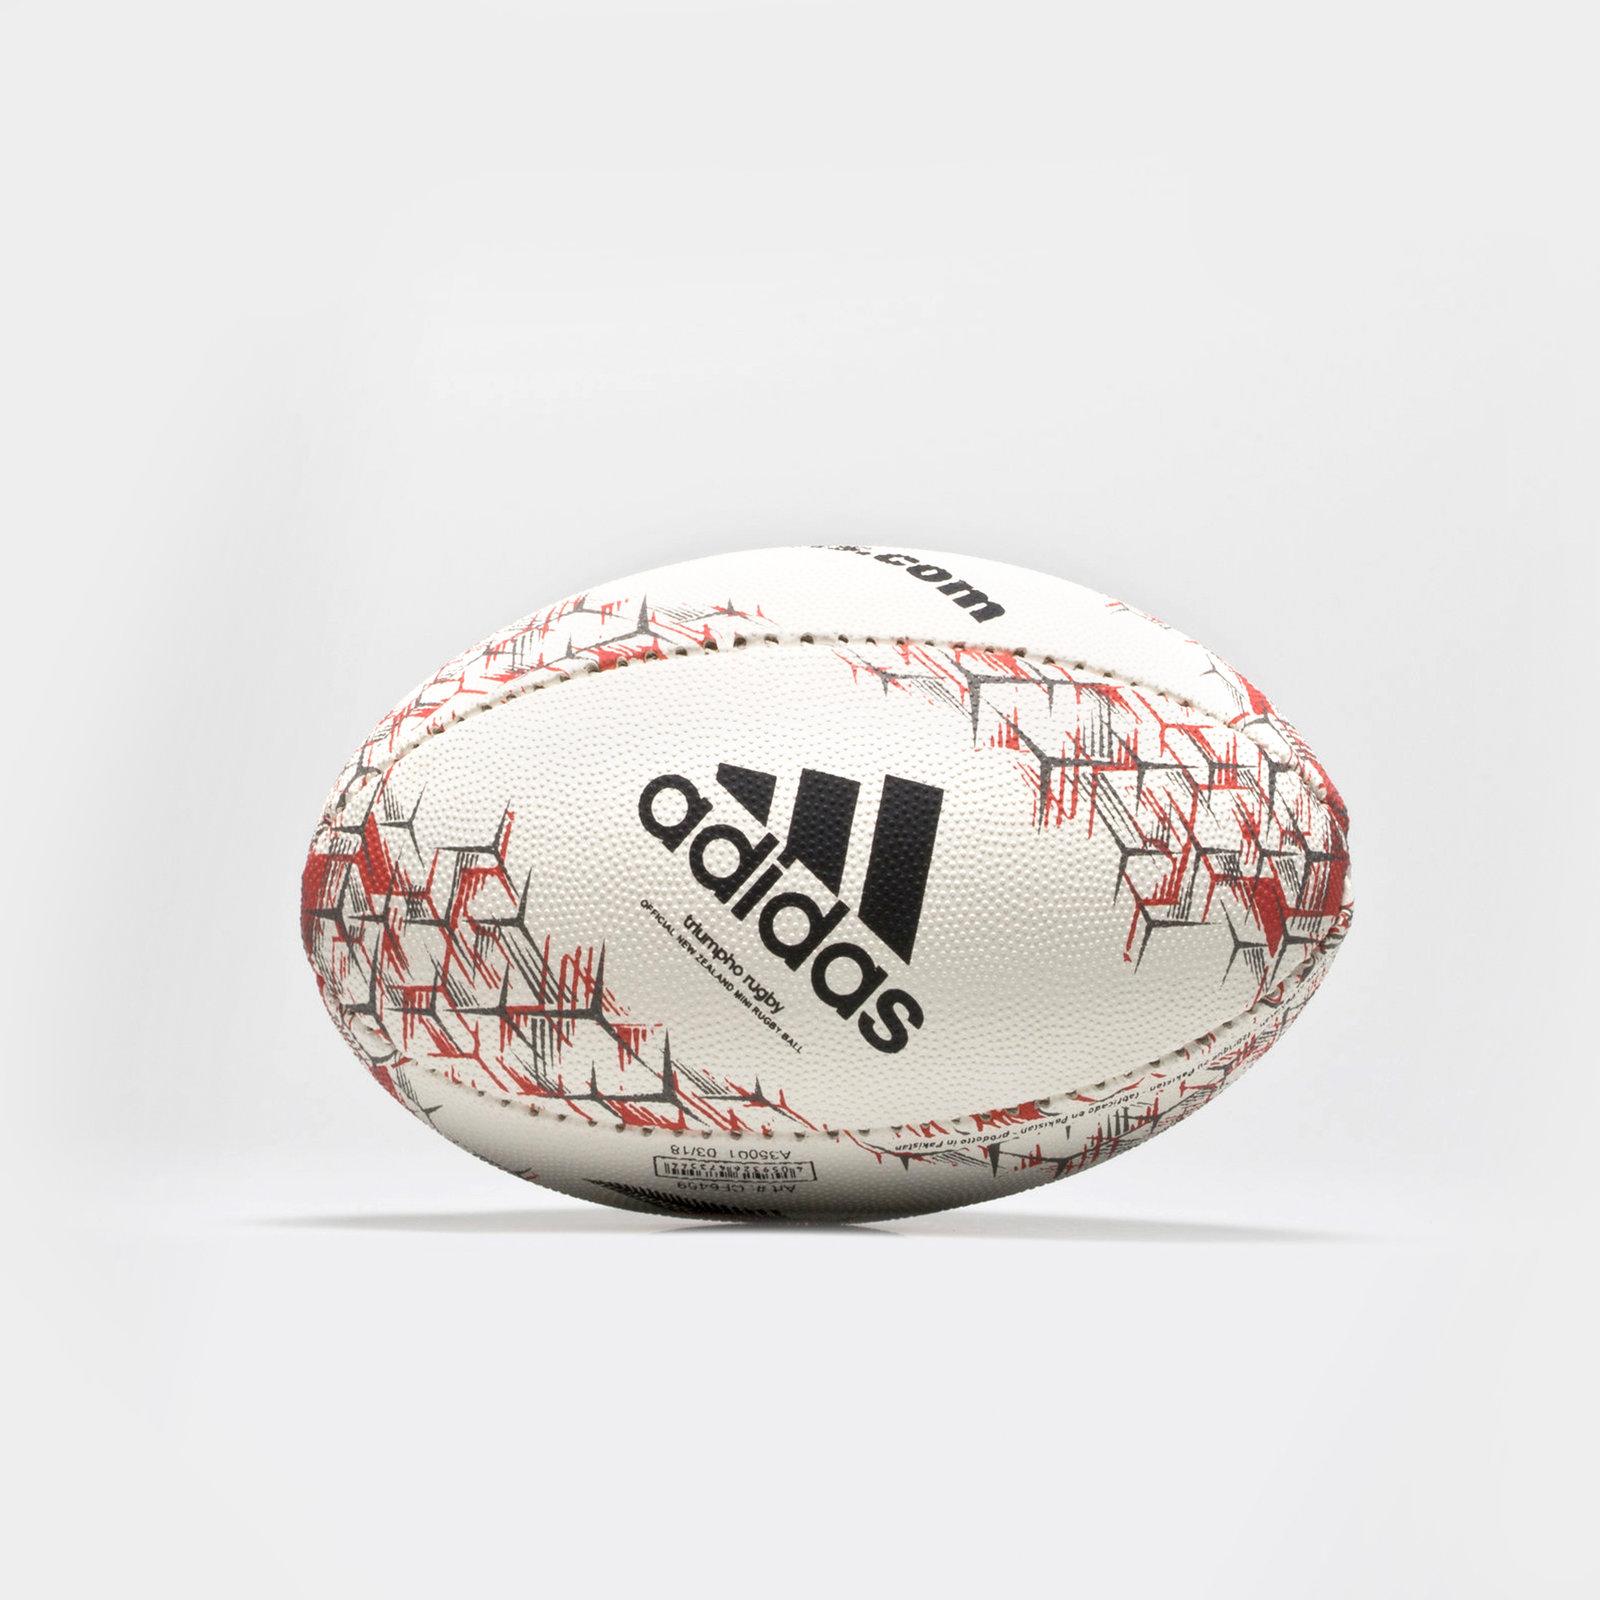 d371b5147bab adidas Unisex New Zealand All Blacks 2018 Mini Rugby Ball White Sports  Training